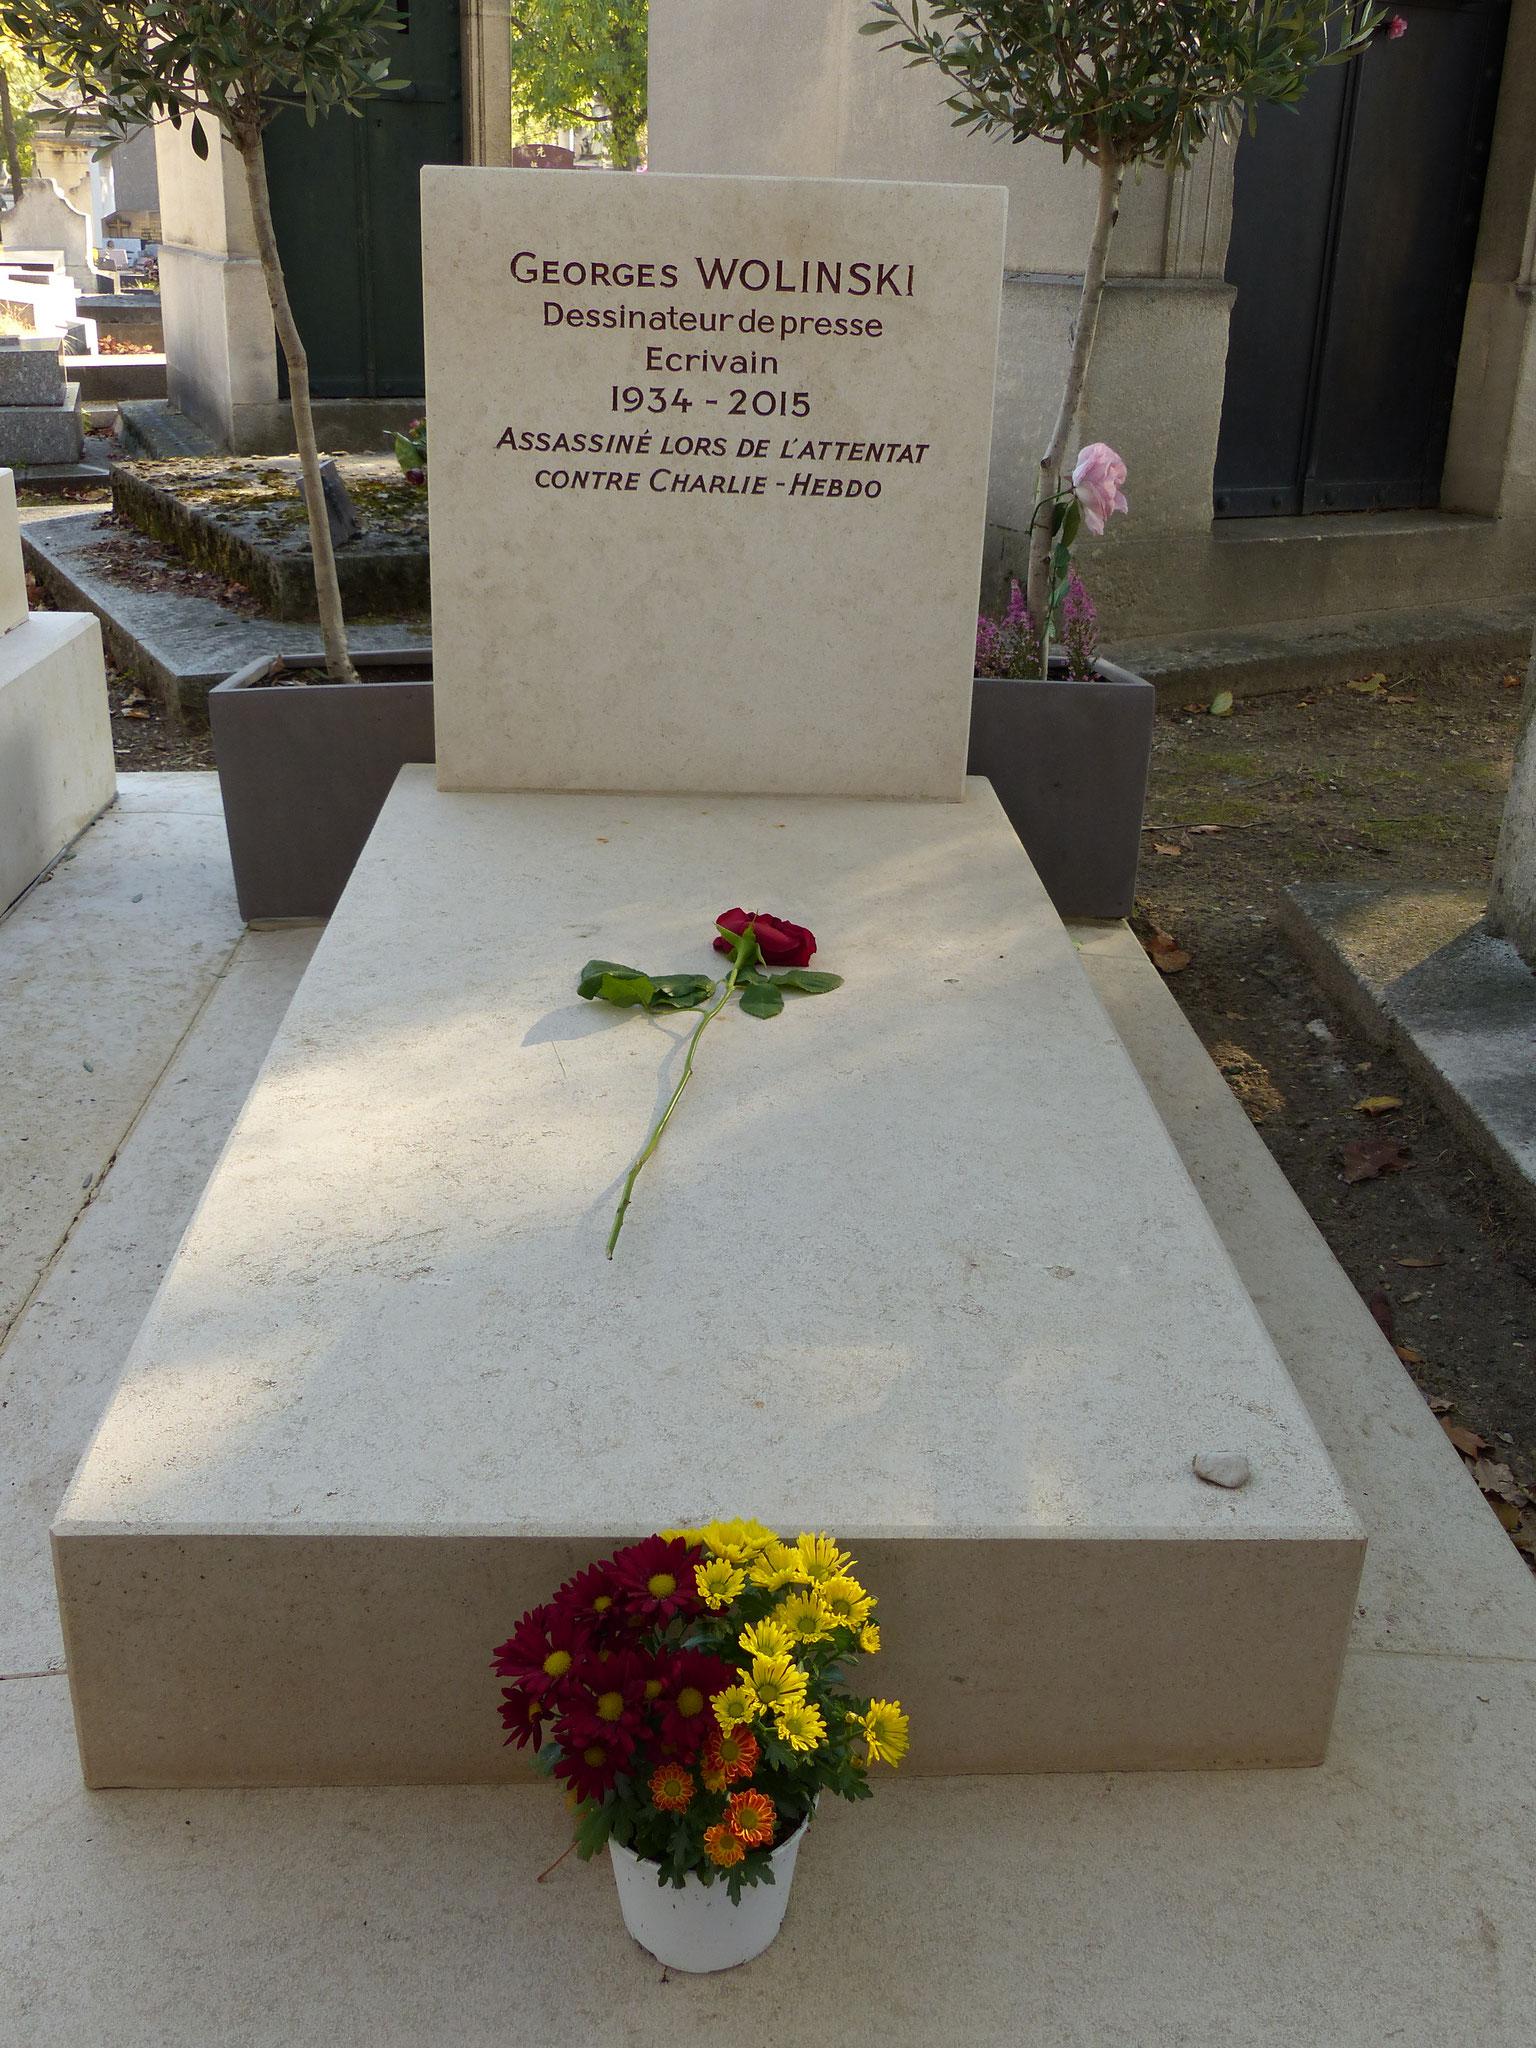 Georges Wolinski - 1934 2015